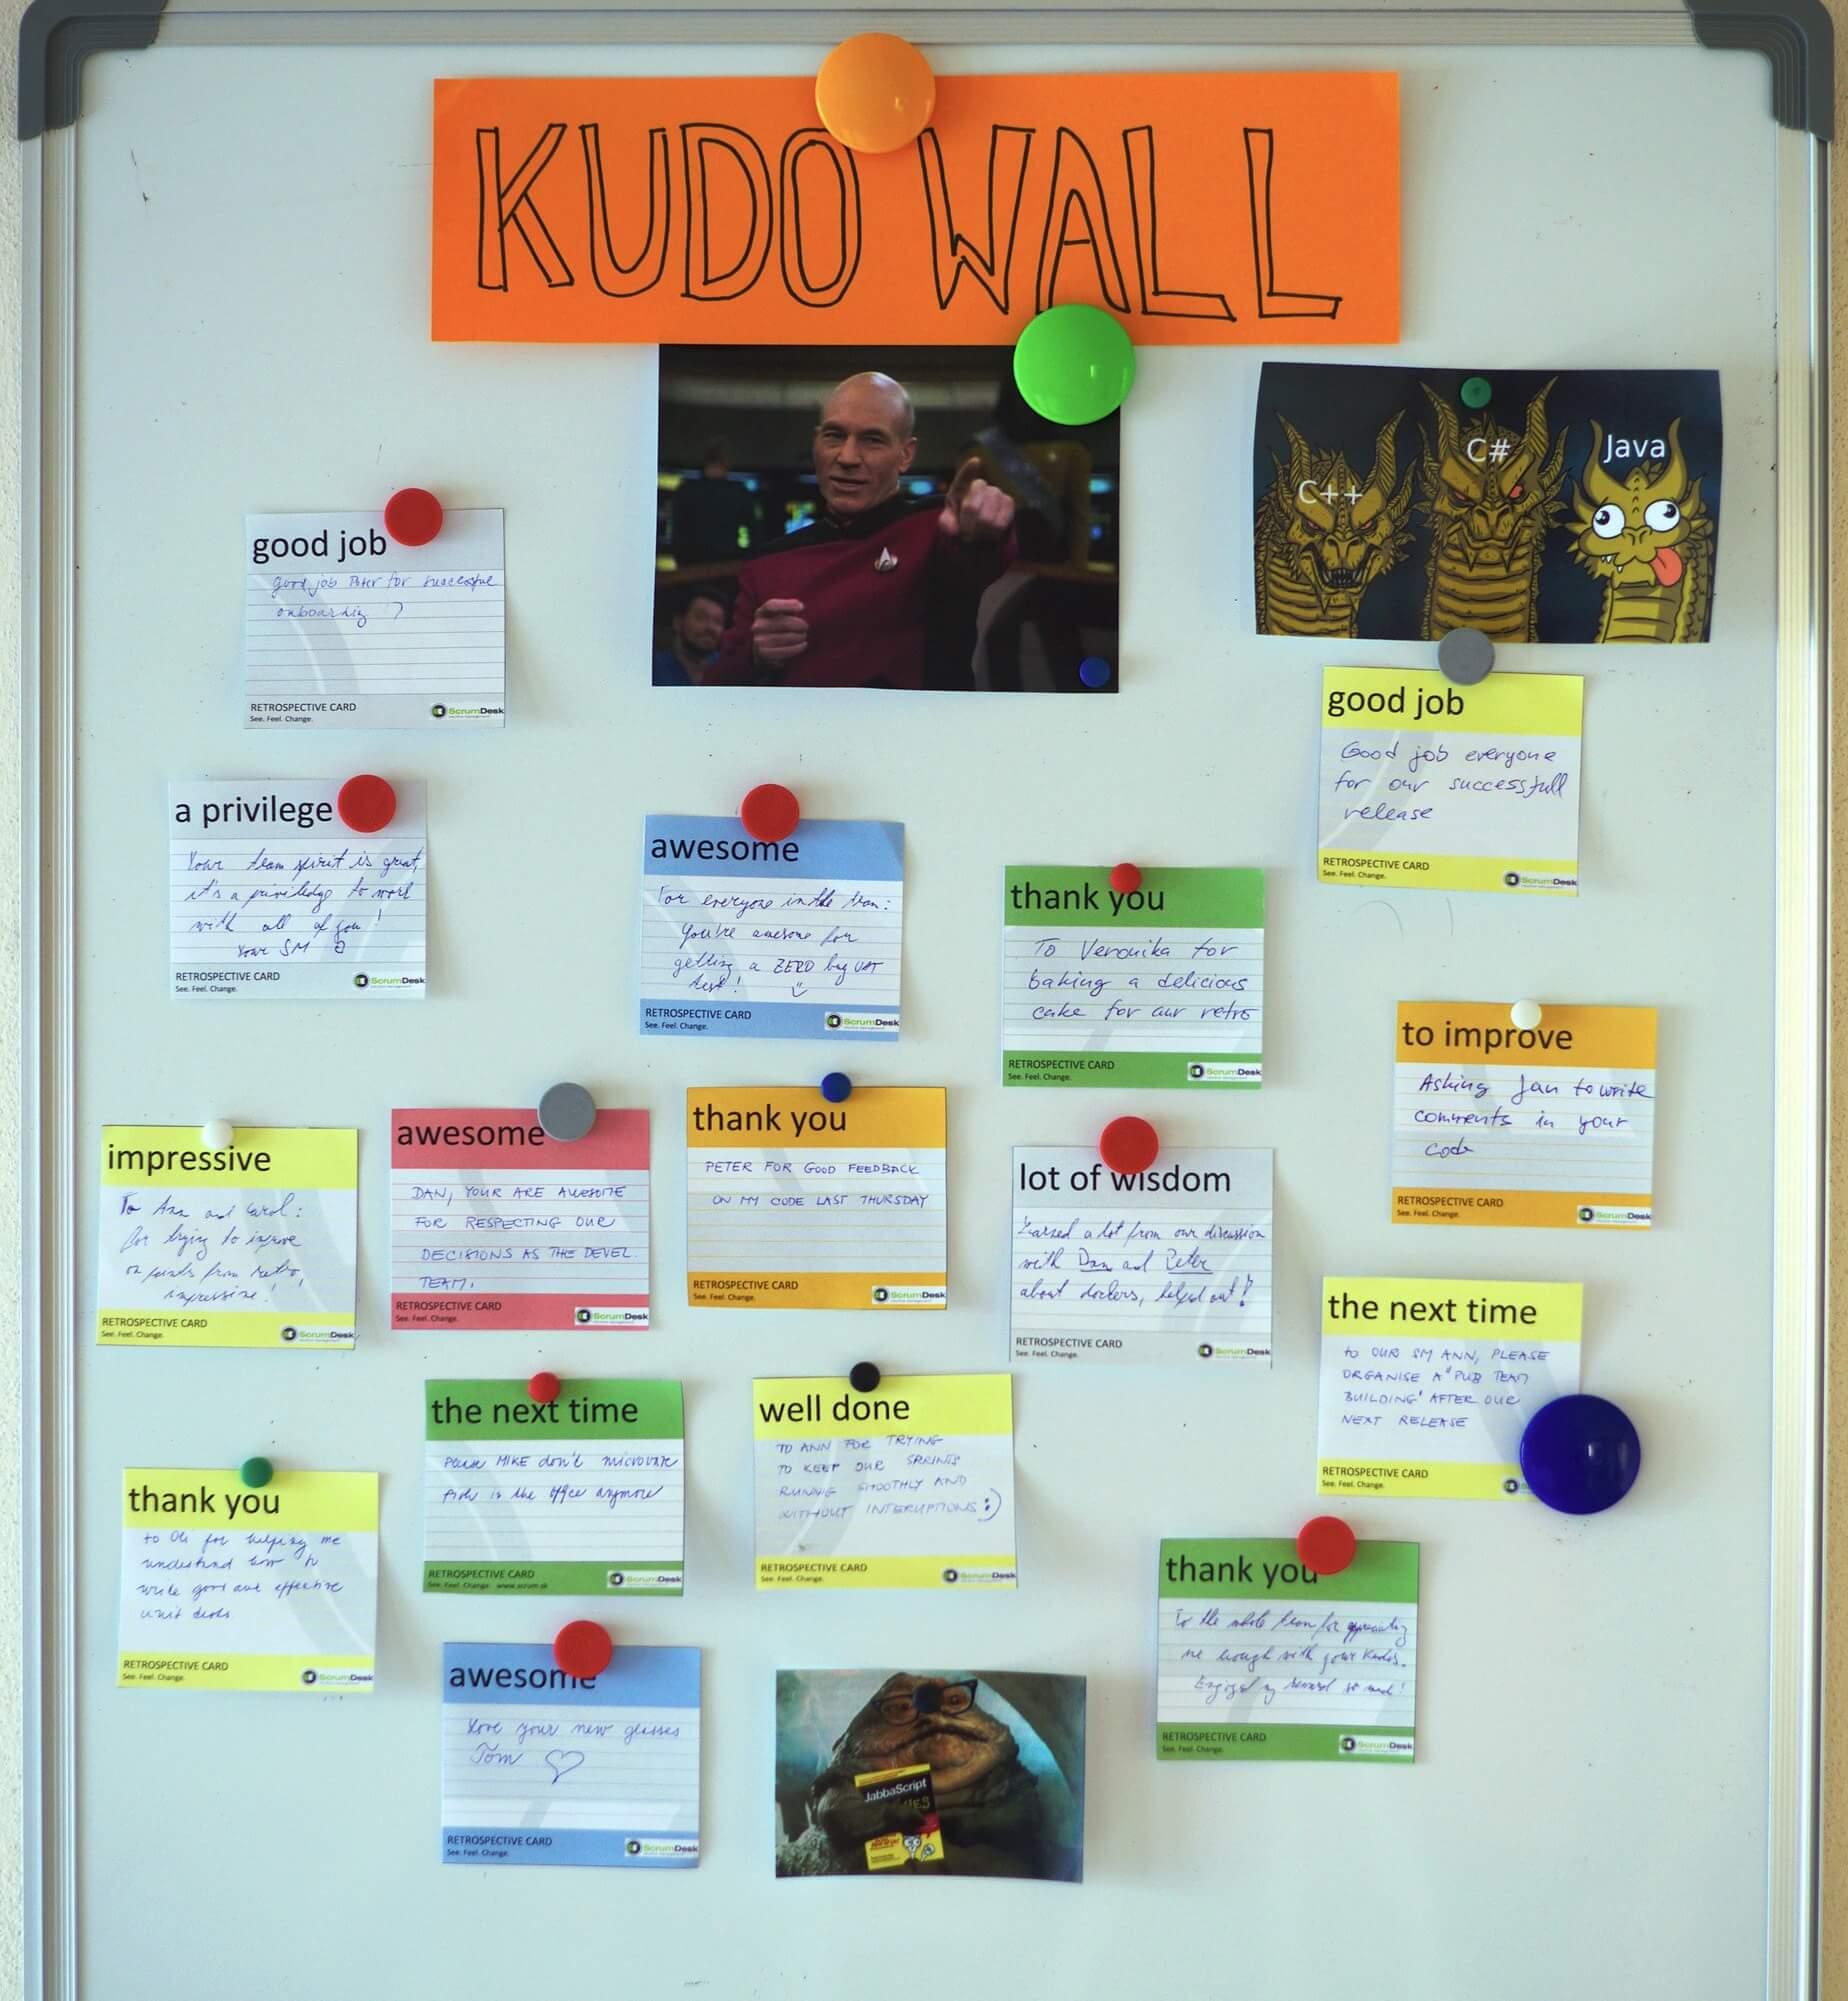 Kudo wall